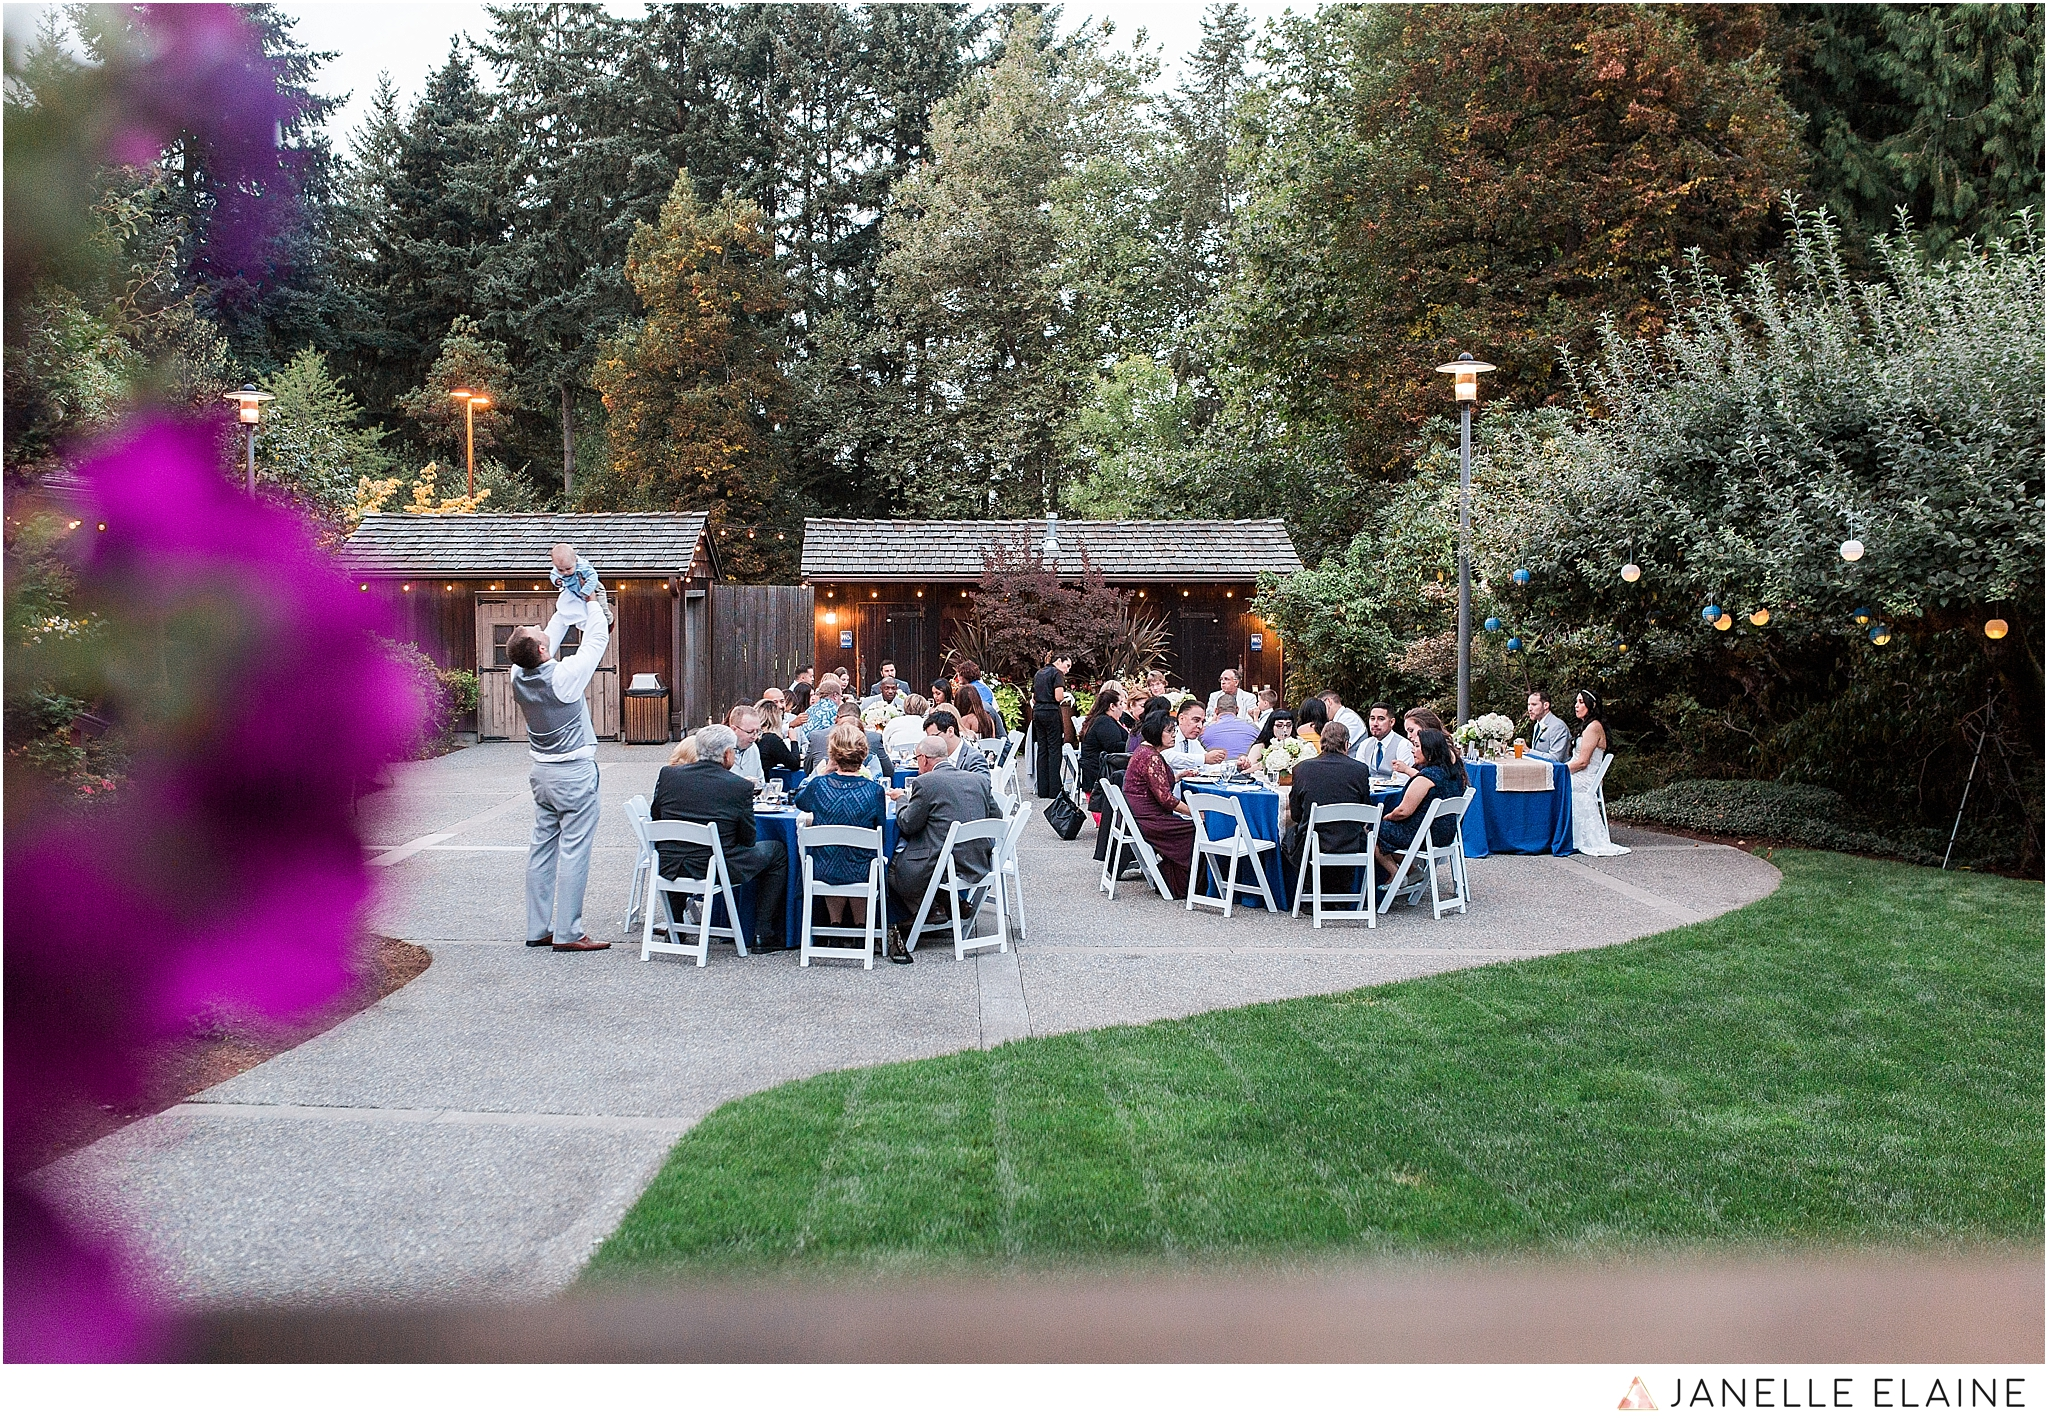 janelle elaine photography-professional wedding photographer-seattle-bellevue-robinswood house-263.jpg